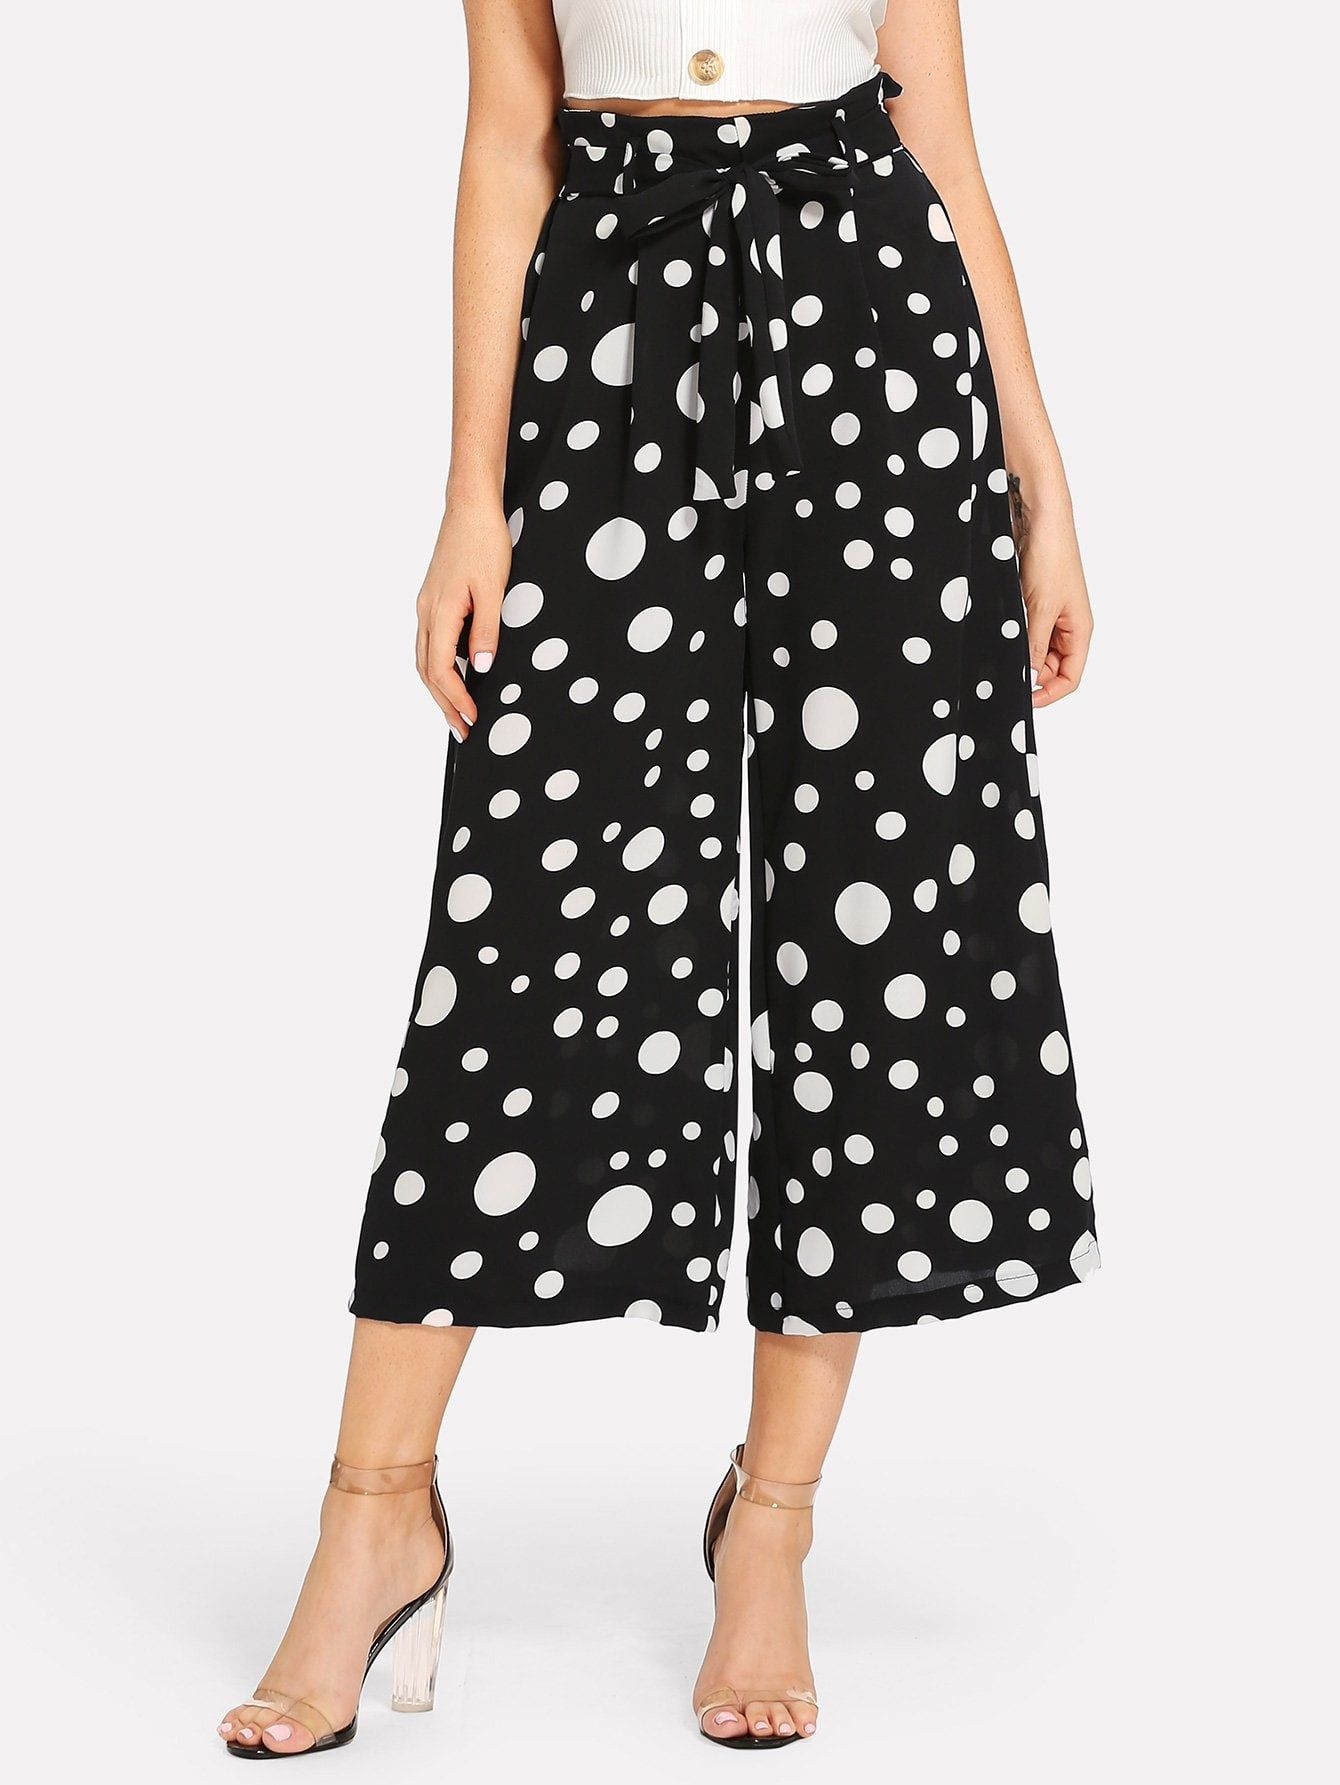 b18280e6fd Boho Polka Dot Wide Leg Loose Drawstring Waist Mid Waist Black and White  Capris Length Polka Dot Print Palazzo Leg Pants